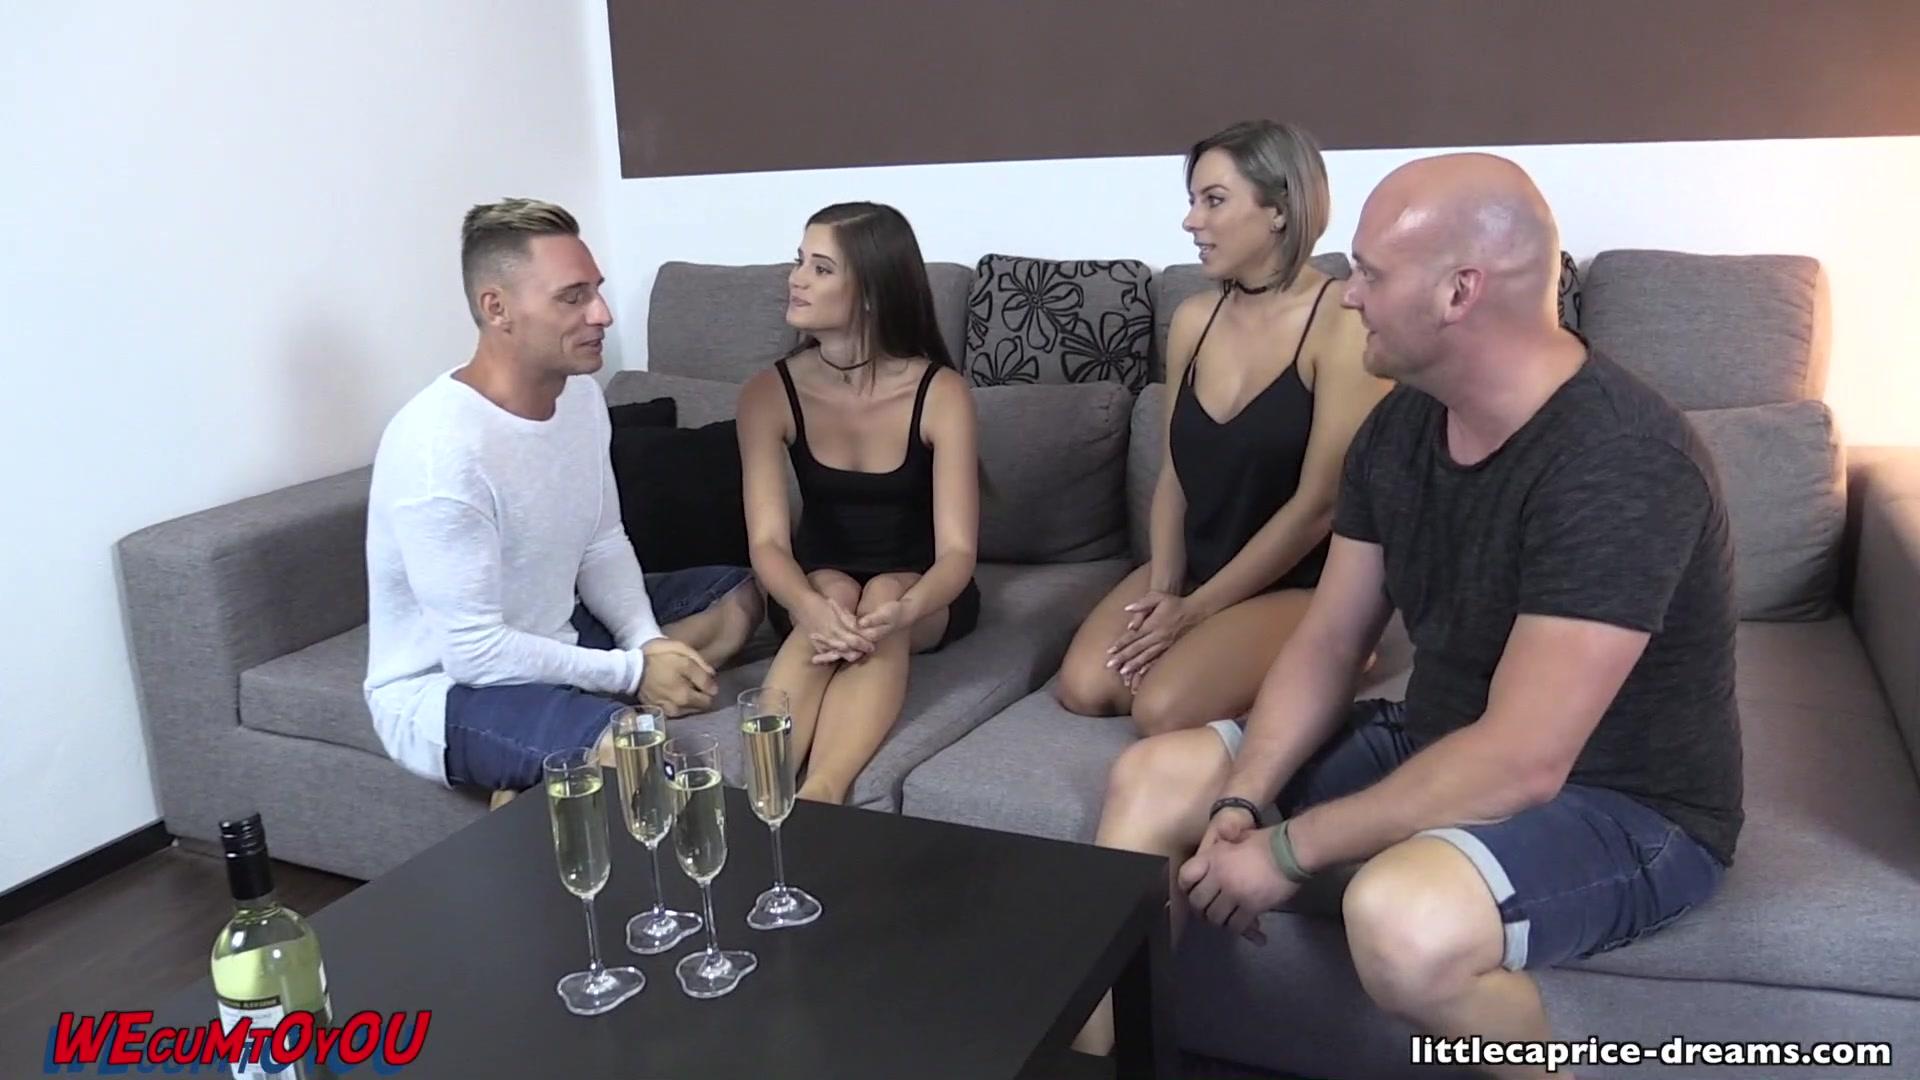 Adrianne interracial anal porn video